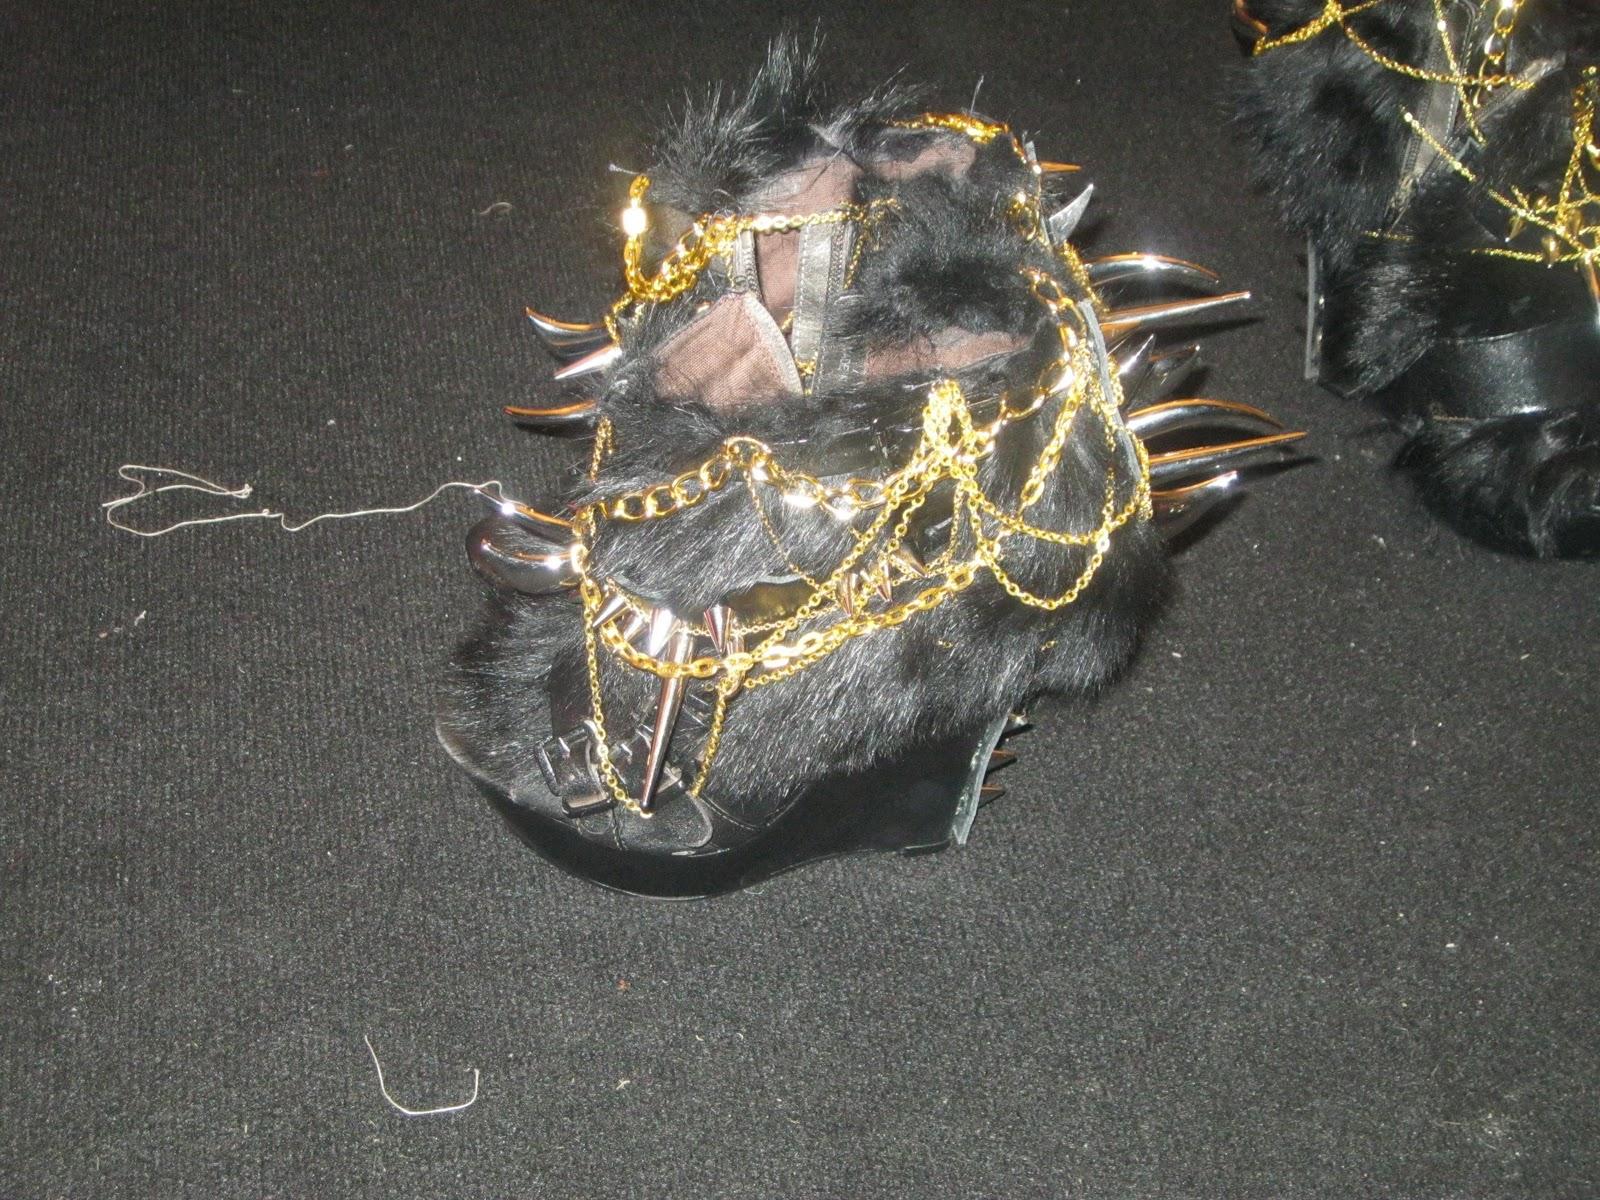 http://2.bp.blogspot.com/-uunJVWgOvjY/TWBh18LD3WI/AAAAAAAAAhY/xmERLtiKcFc/s1600/shoes-+lara+jensen.JPG